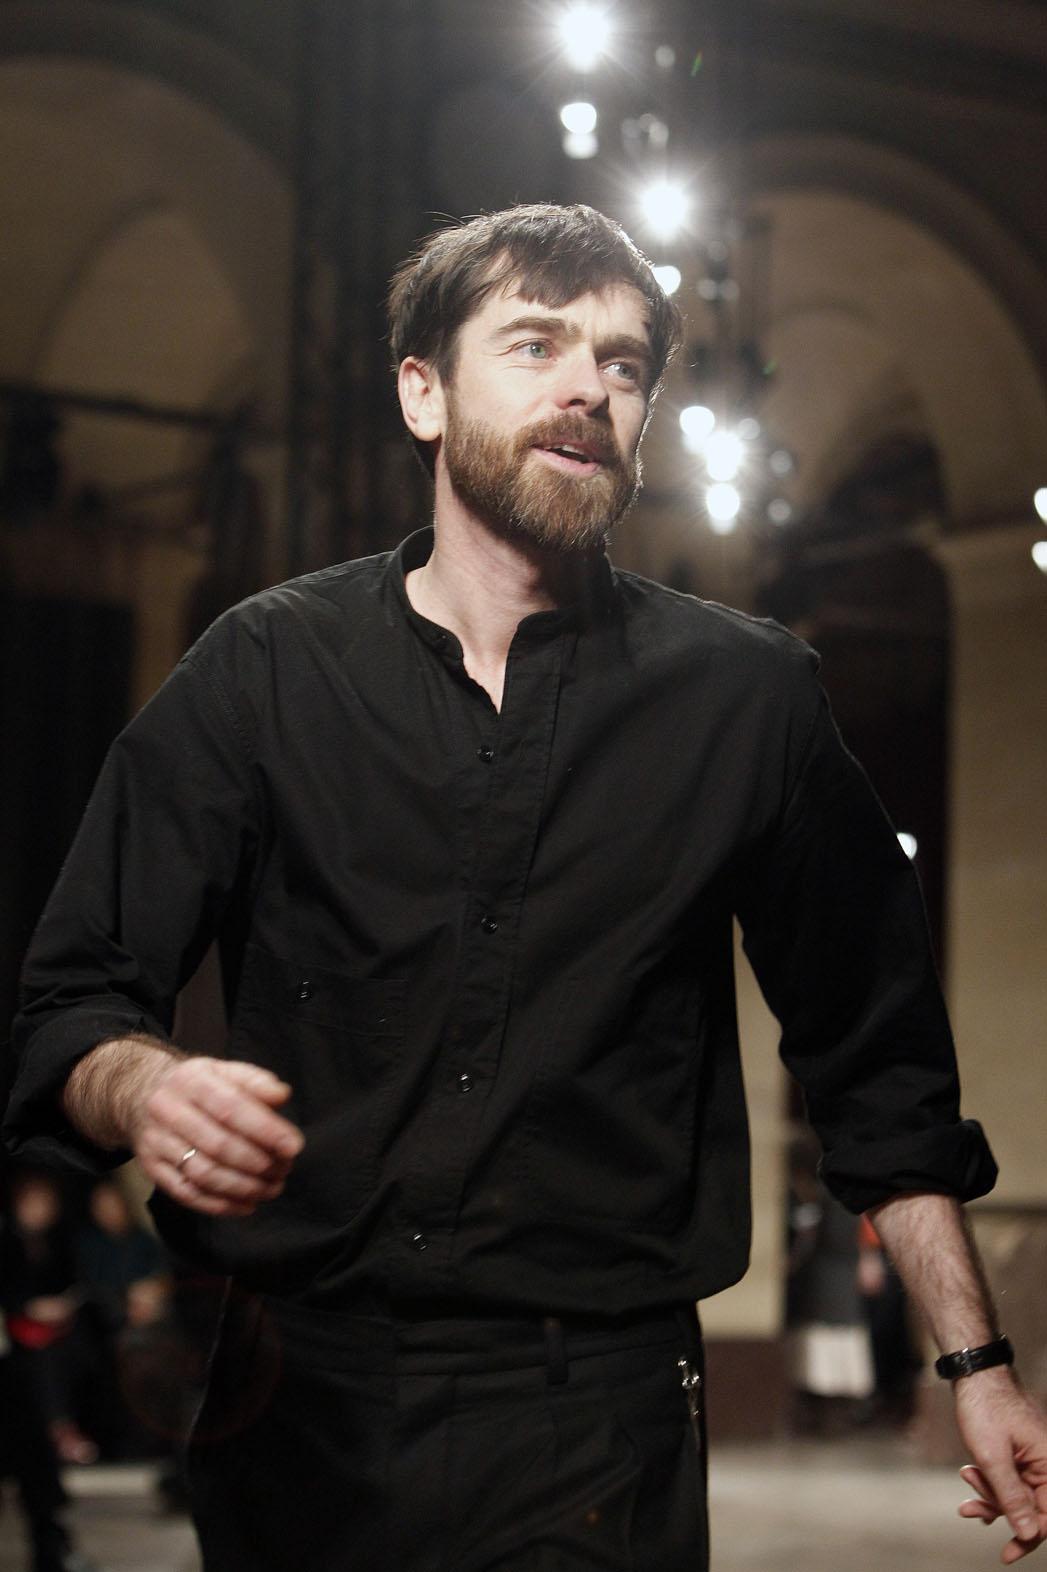 Christophe Lemaire Headshot - P 2014